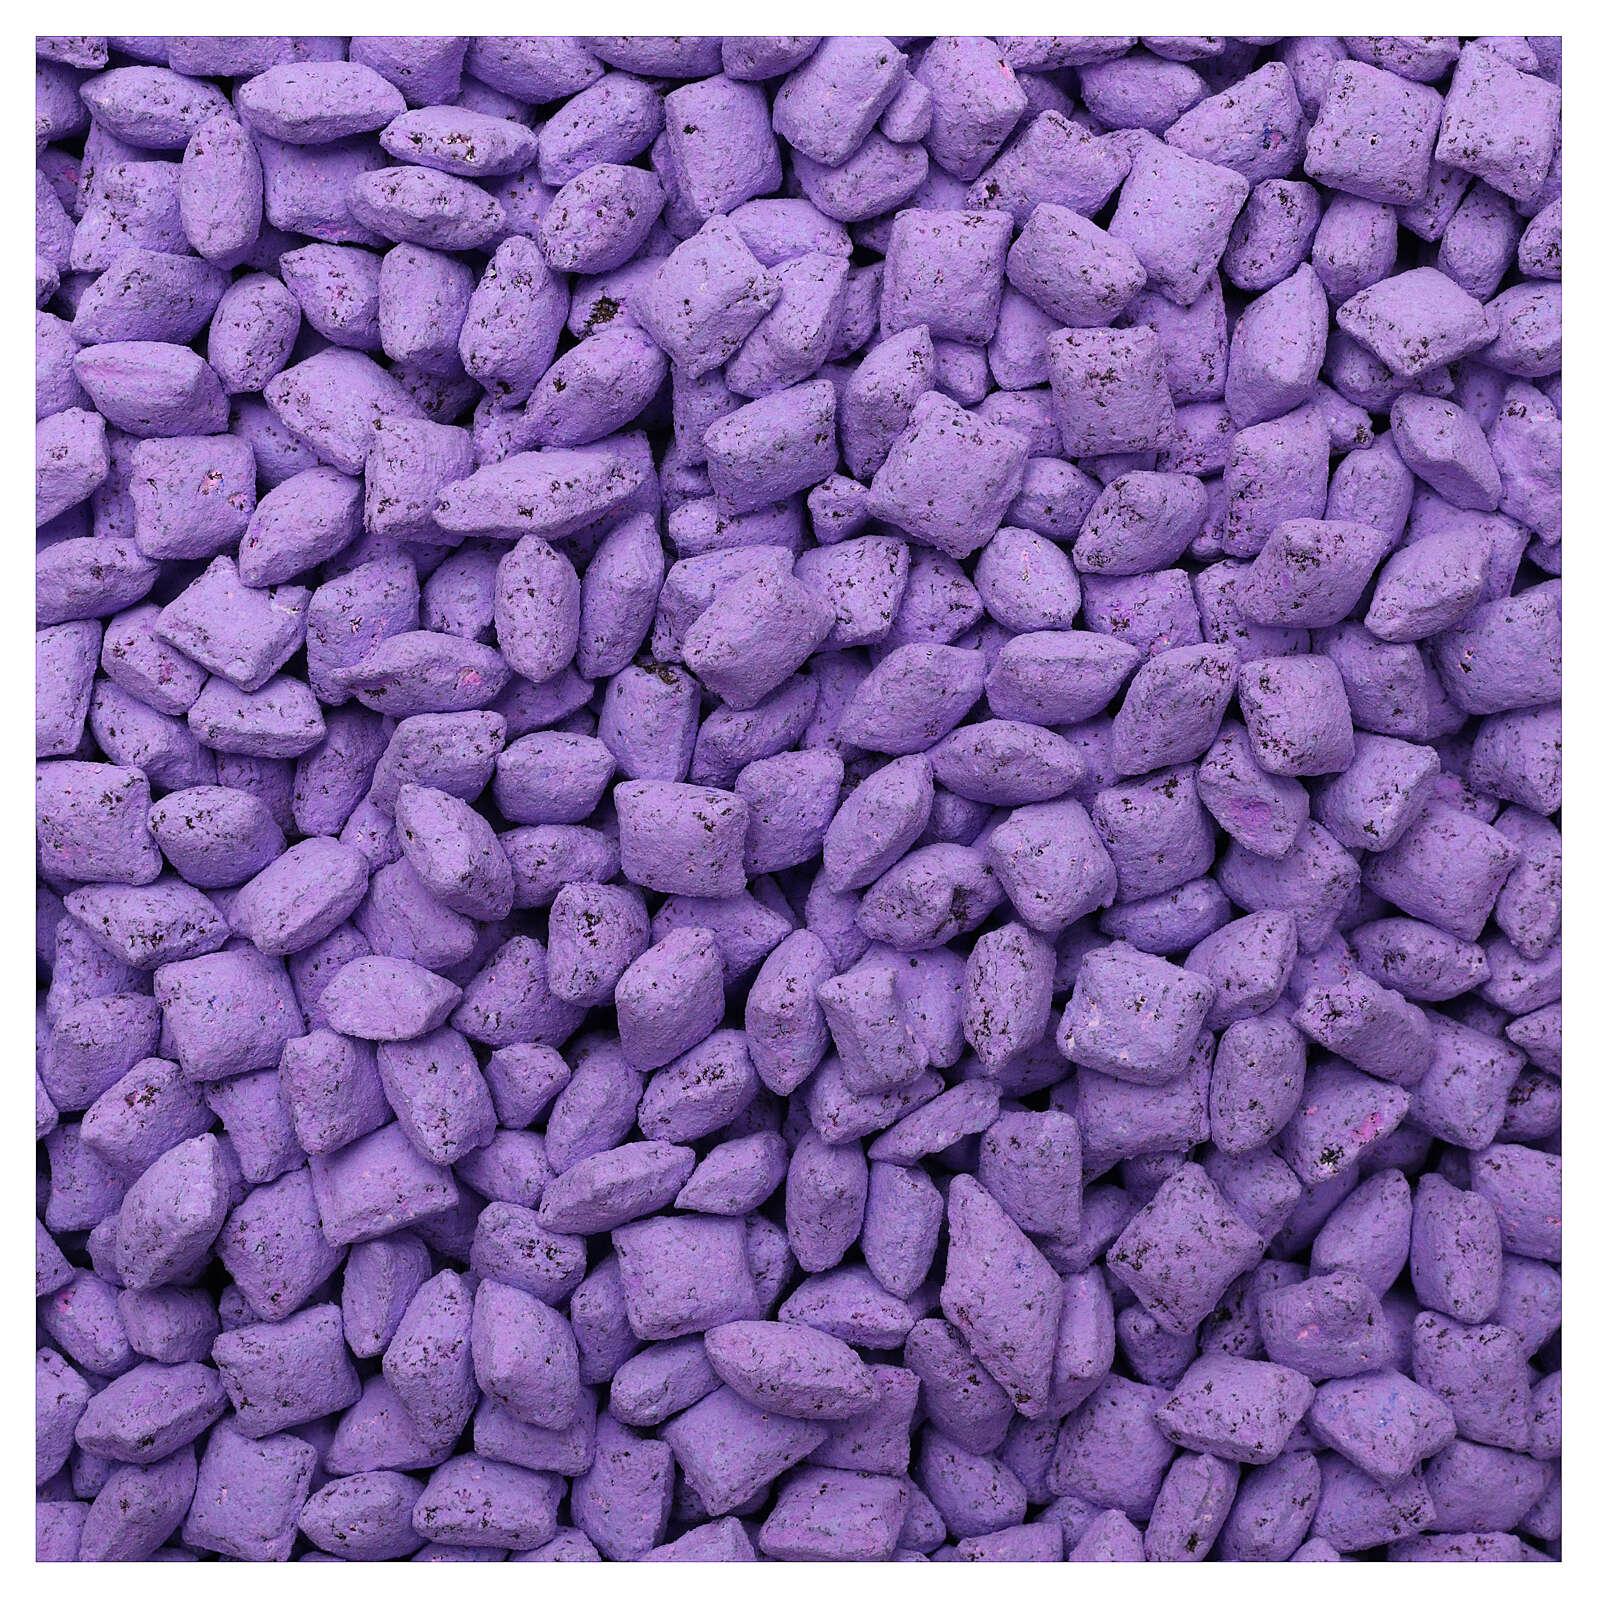 Amostra 10 gr de incenso grego Violeta art. CO000241 3